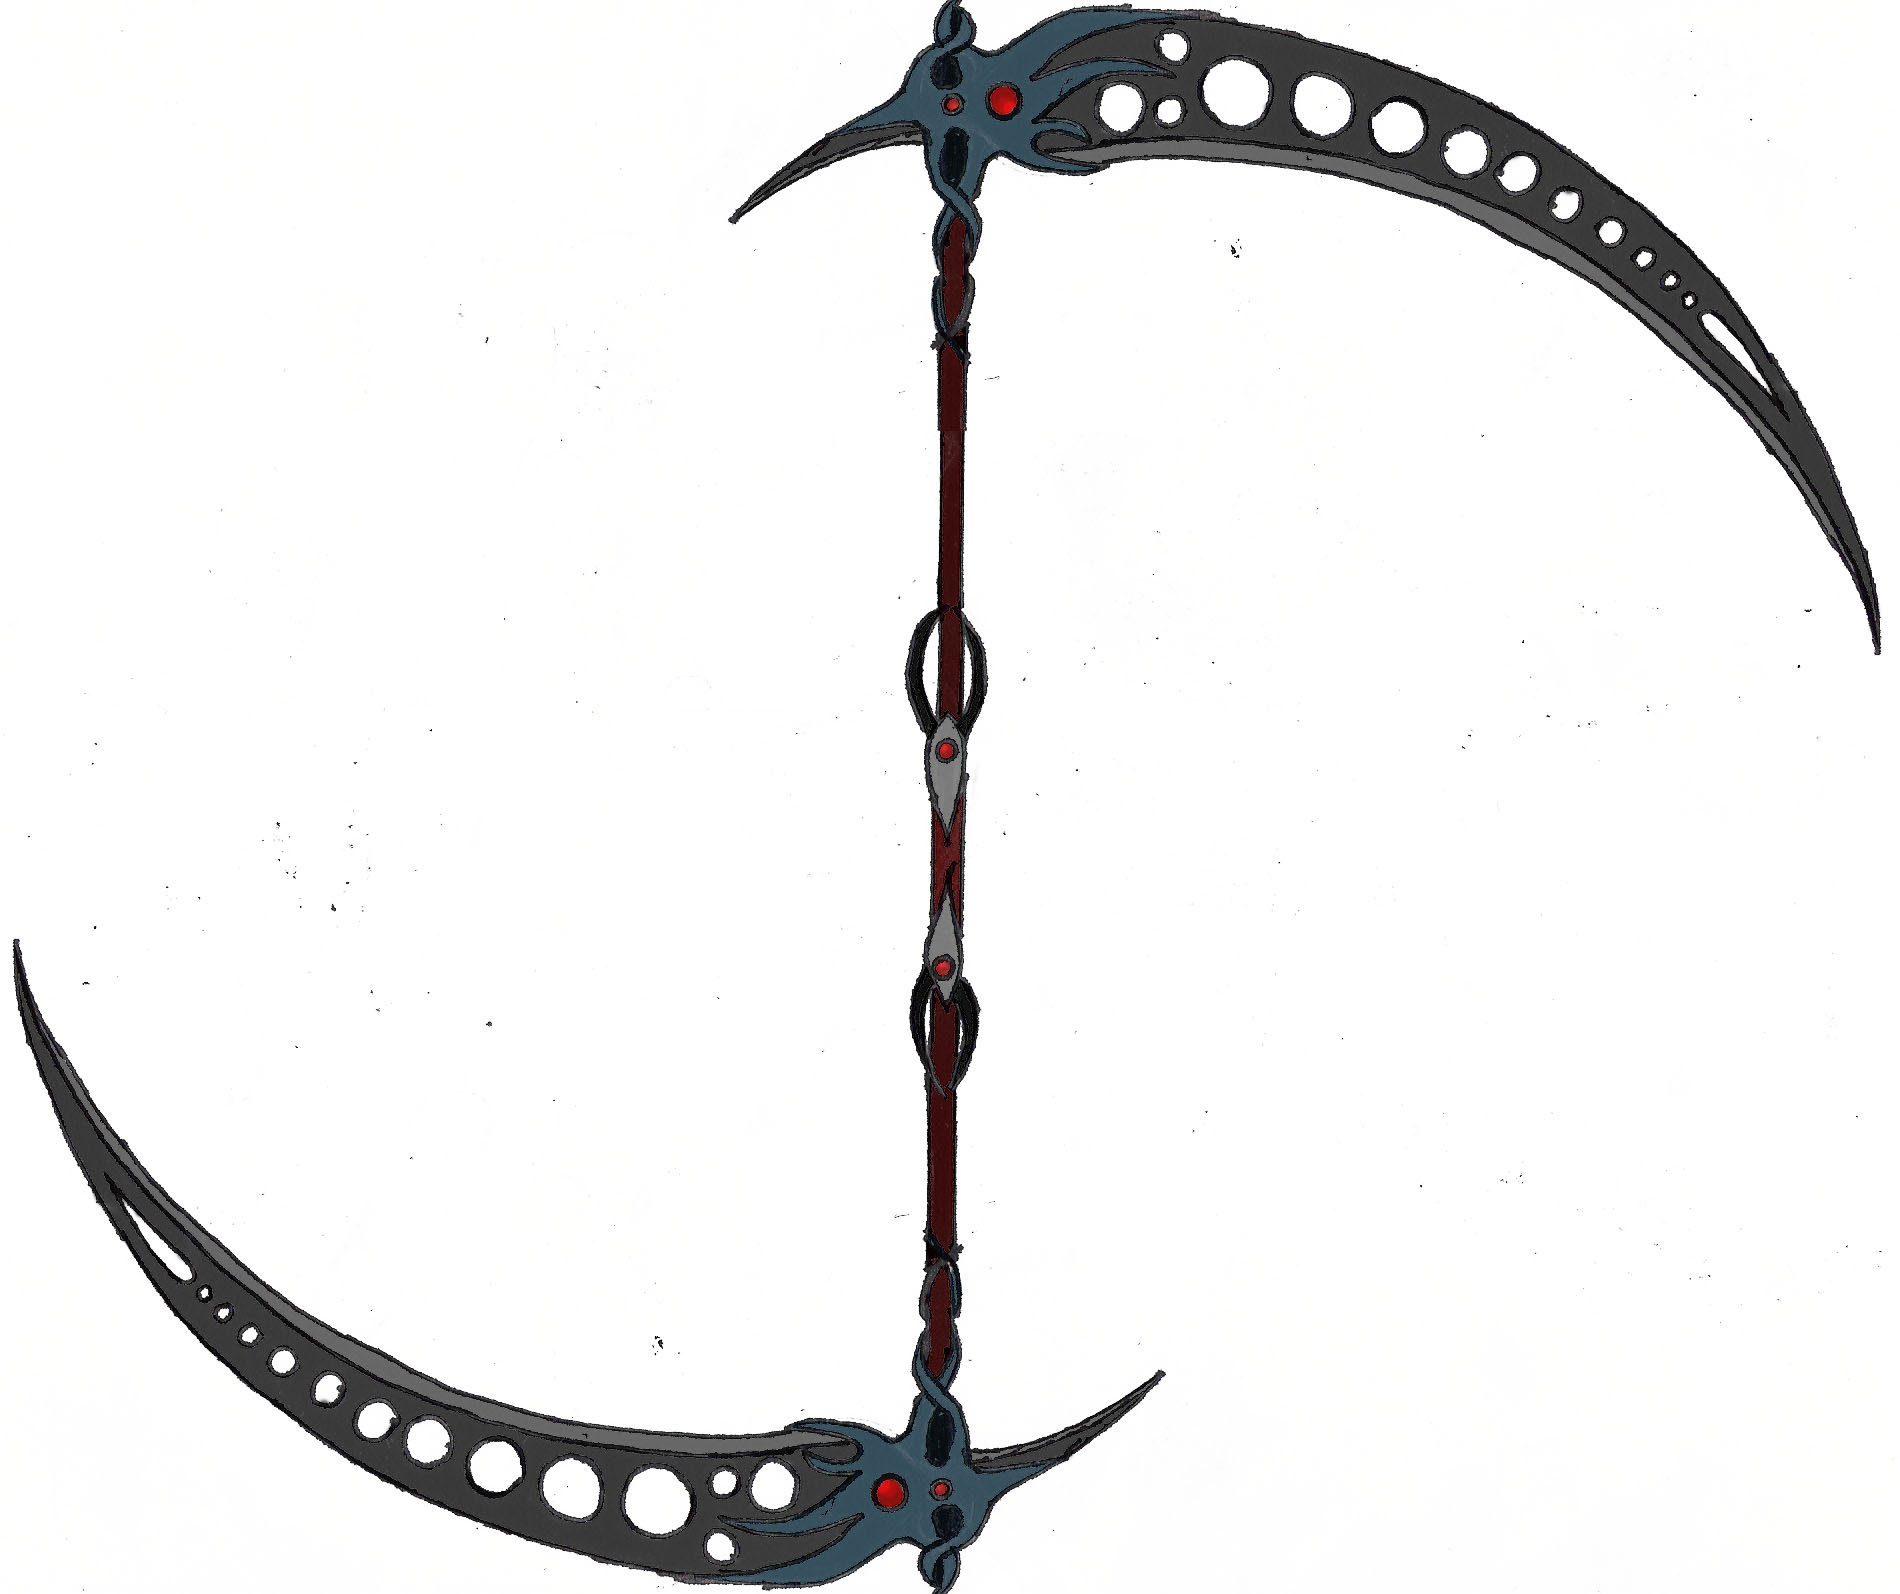 Drawn scythe epic Scythe Double AbscenceOfHeart AbscenceOfHeart Scythe